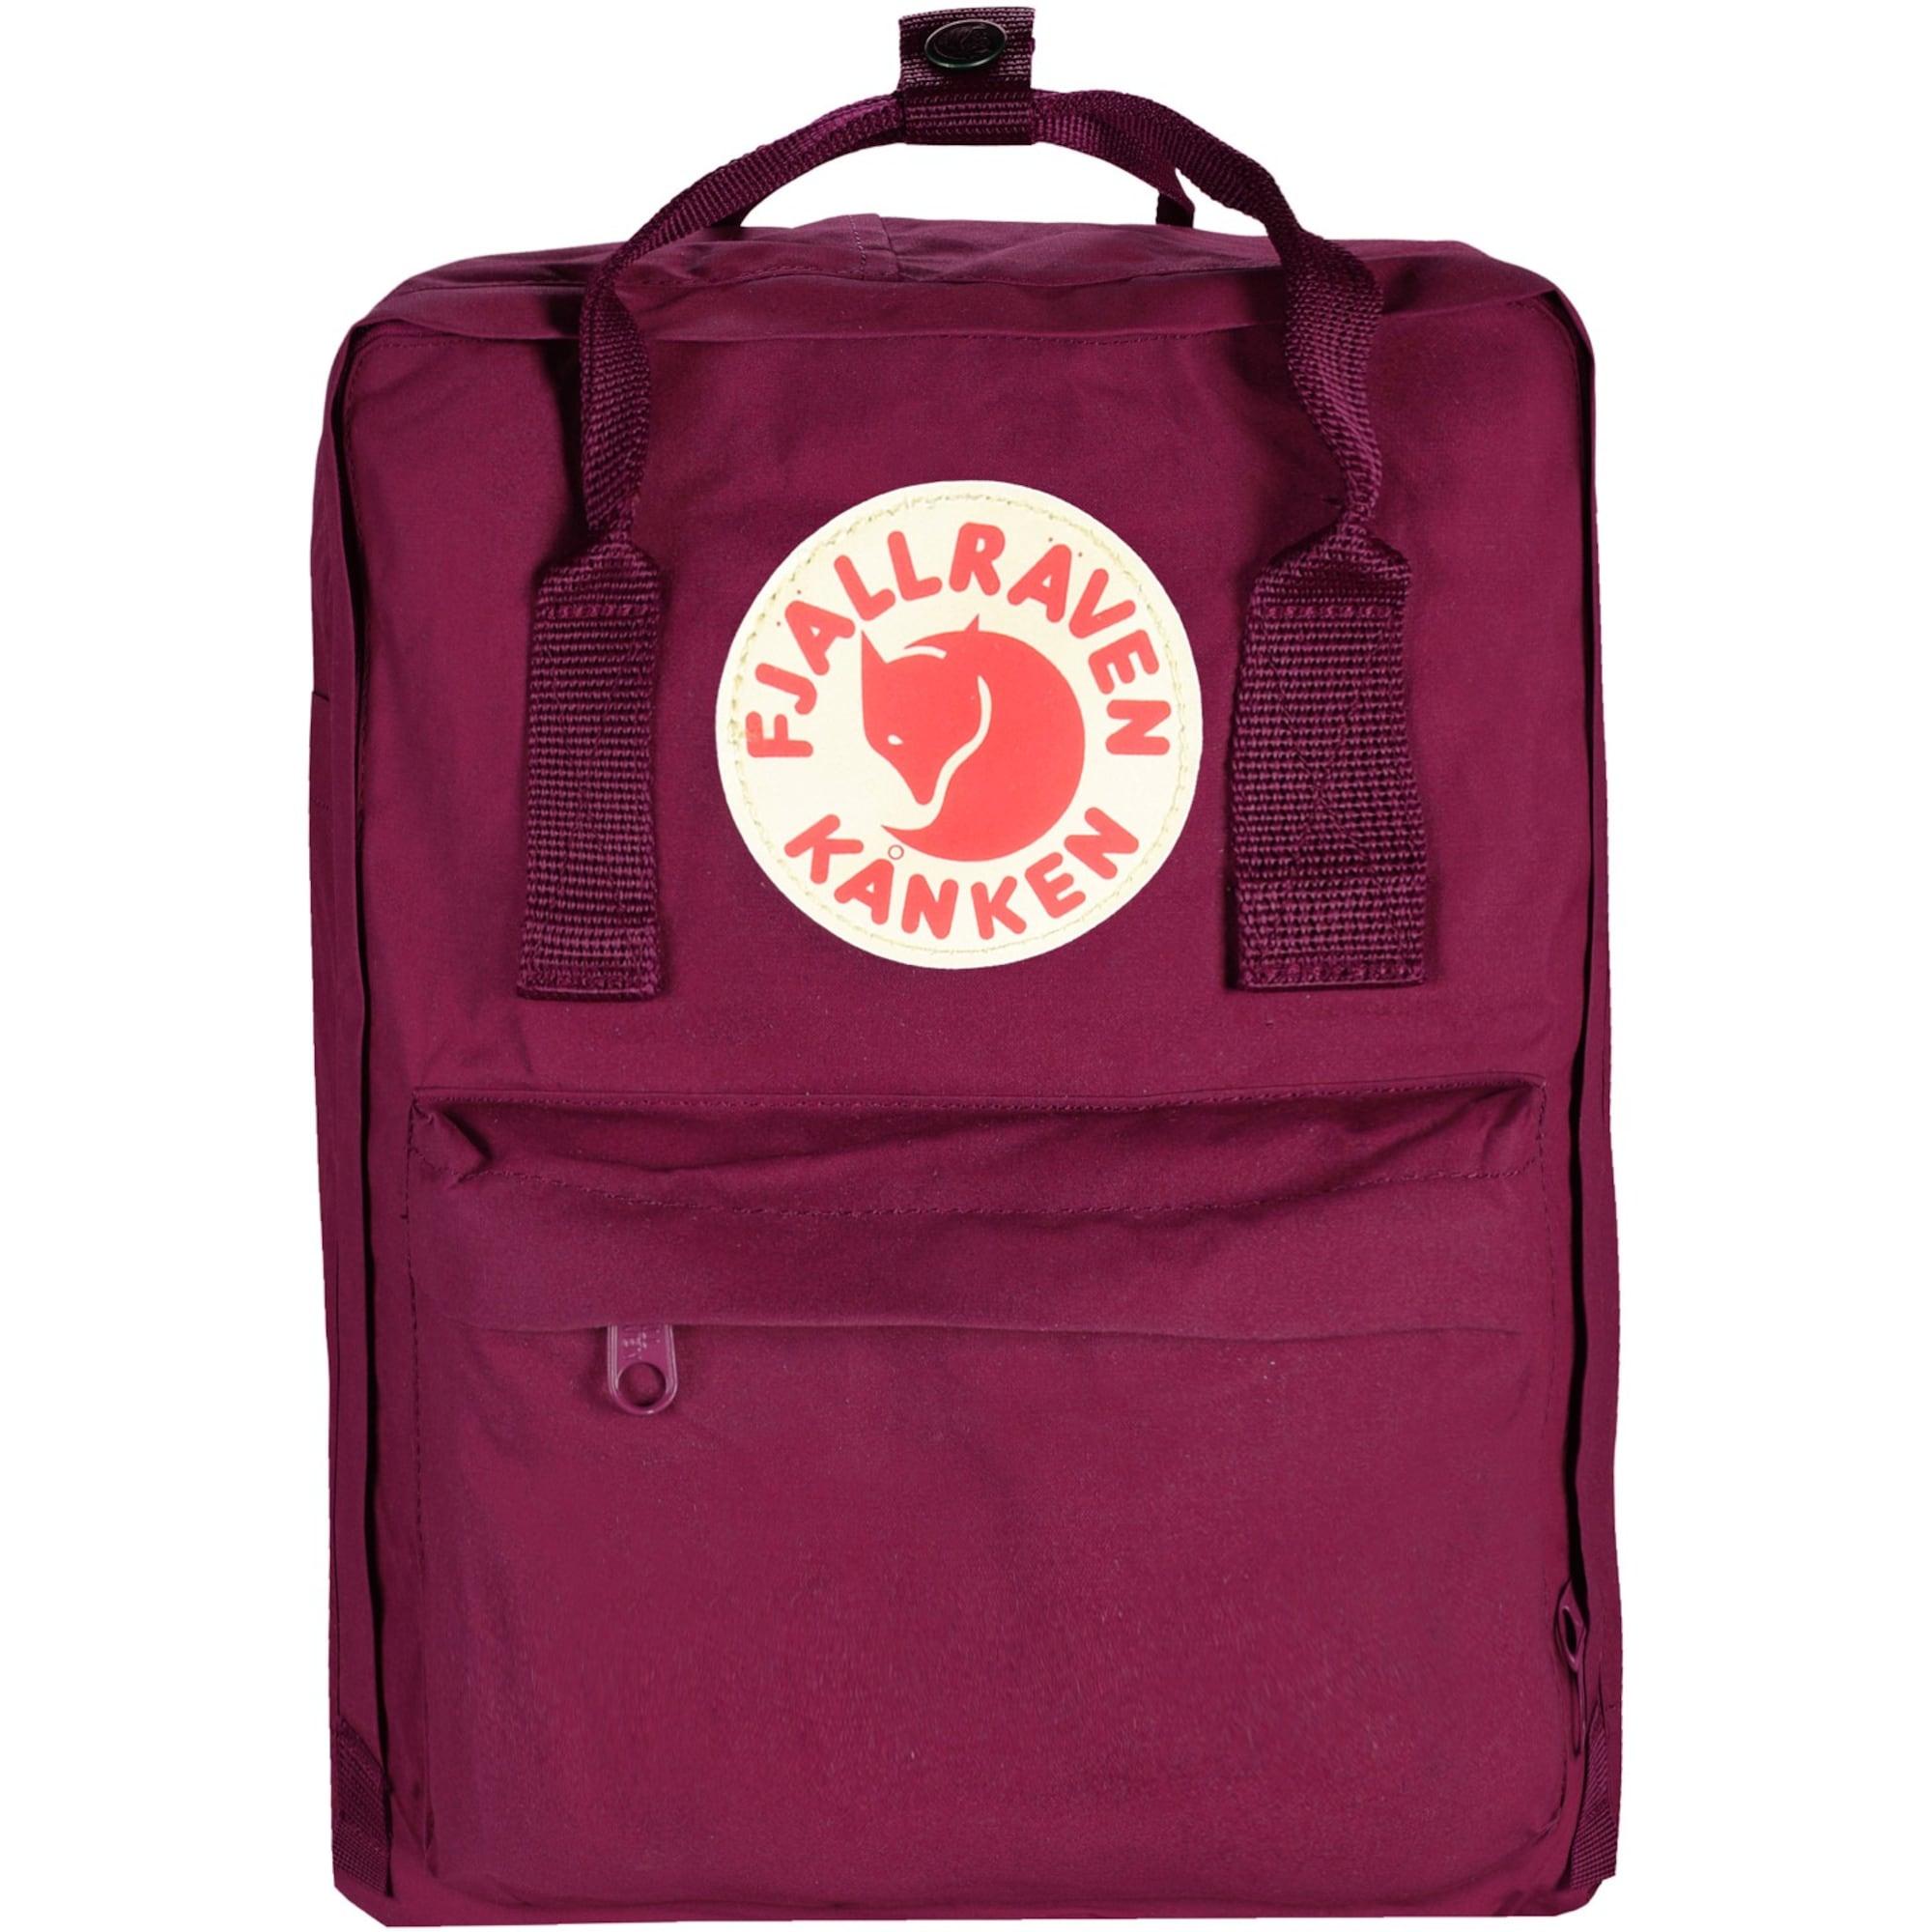 Rucksack | Taschen > Rucksäcke | Fjällräven